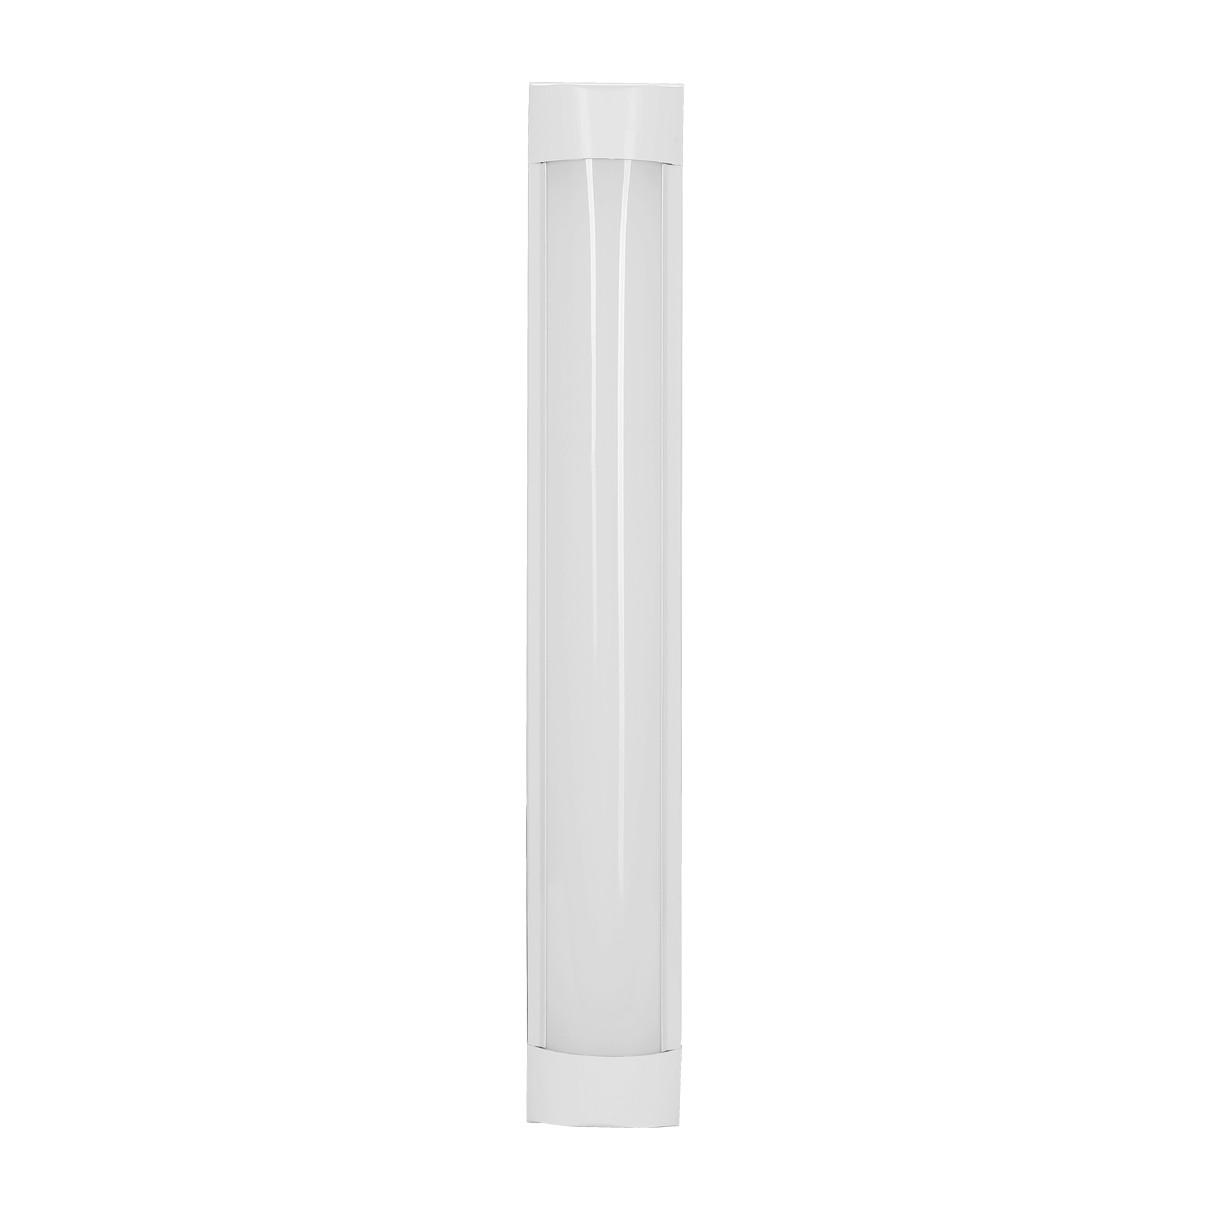 Luminaria Linear Elegance Fit branco frio 18w Avant  - EMPORIO K